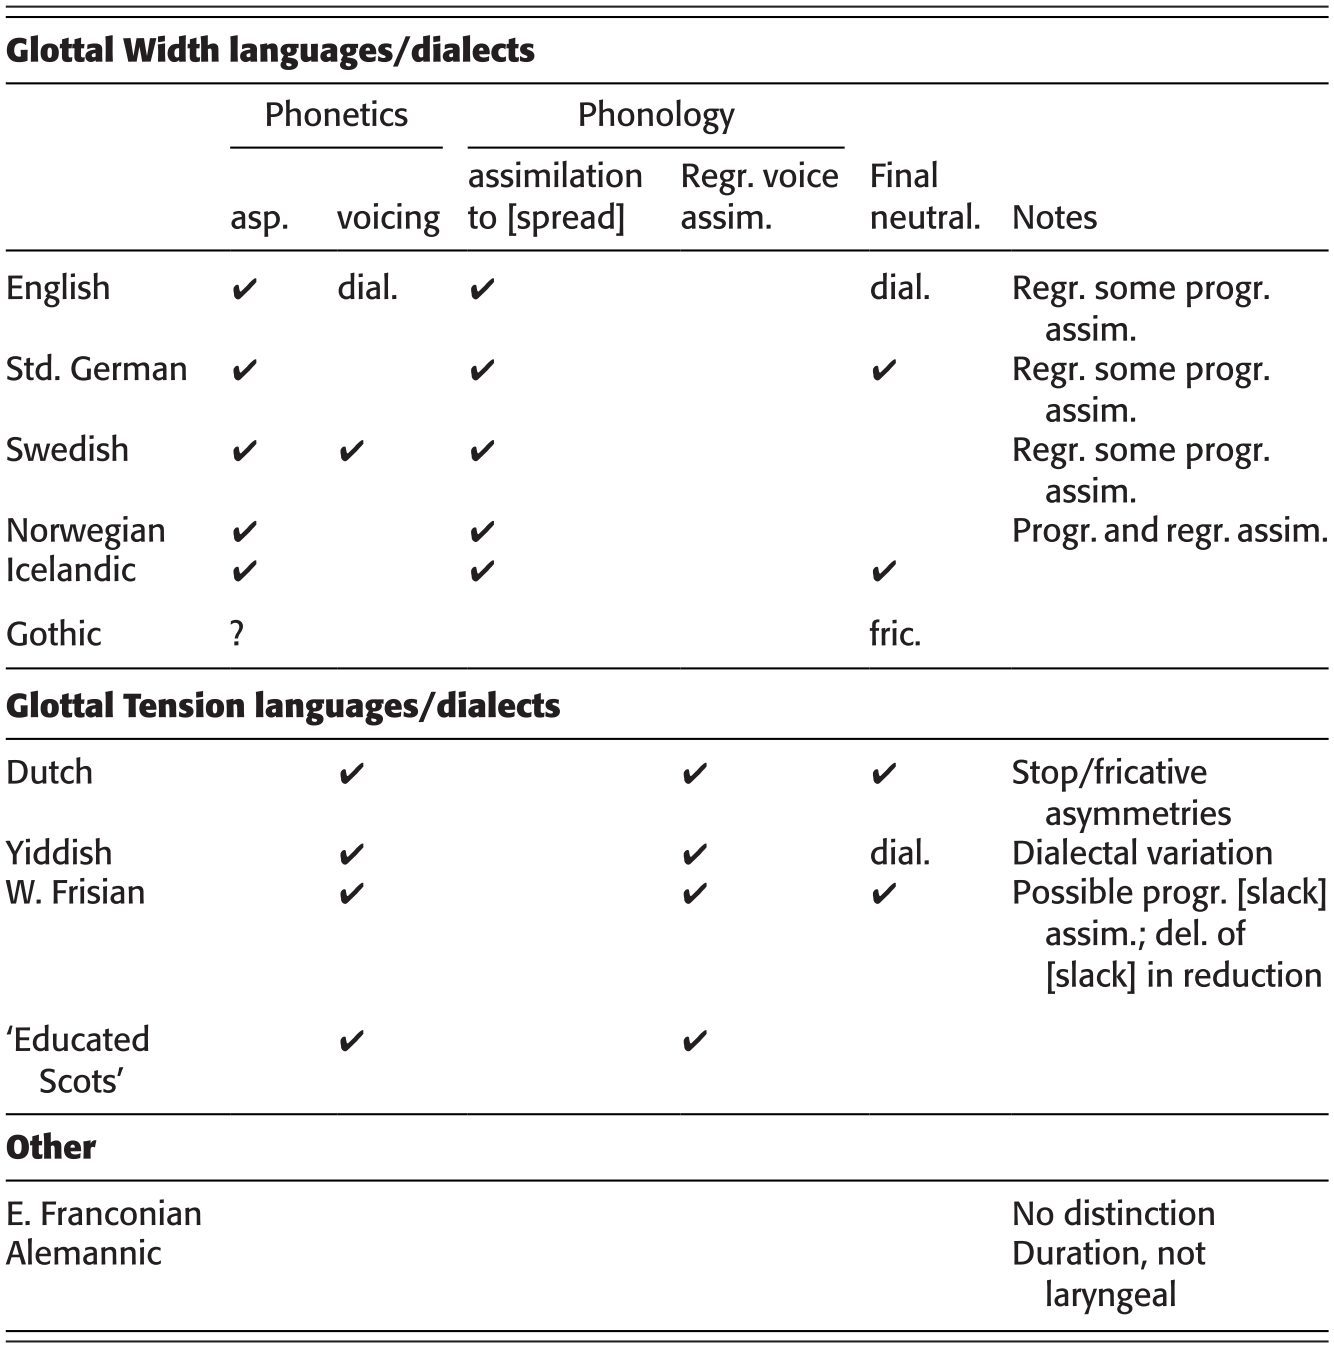 Germanic Laryngeal Phonetics And Phonology Chapter 6 The Cambridge Handbook Of Germanic Linguistics